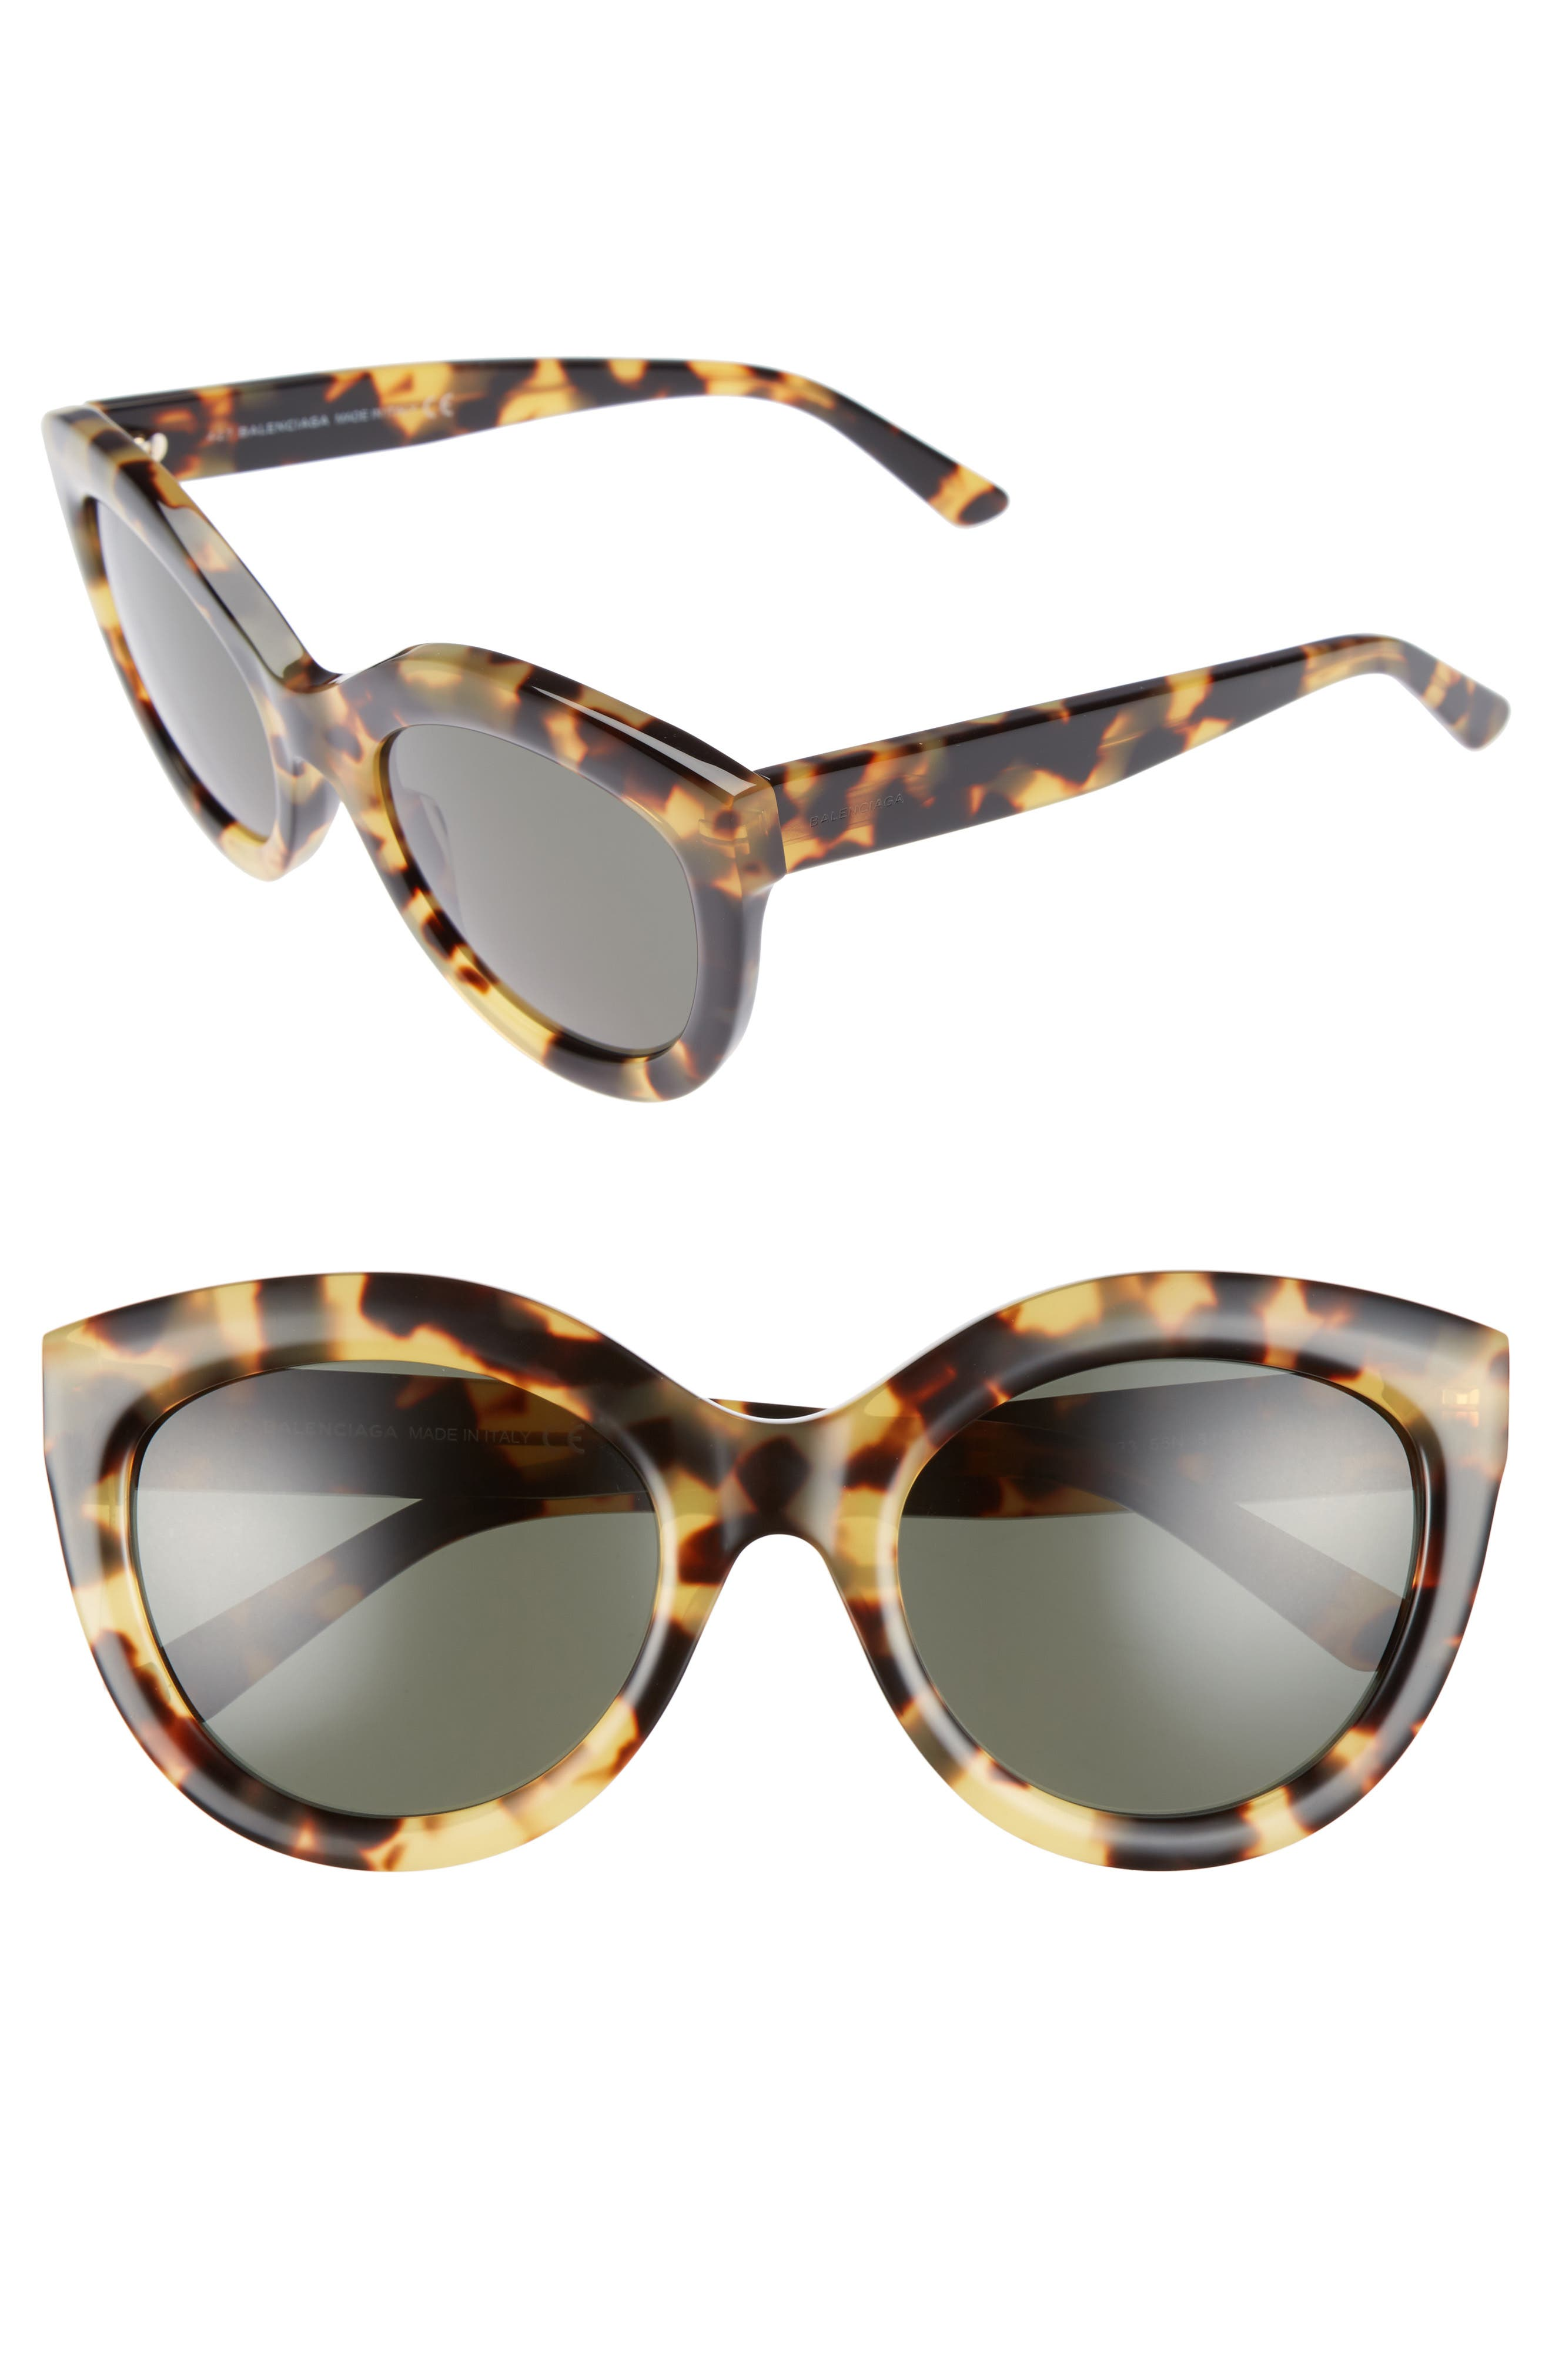 54mm Cat Eye Sunglasses,                             Main thumbnail 1, color,                             200